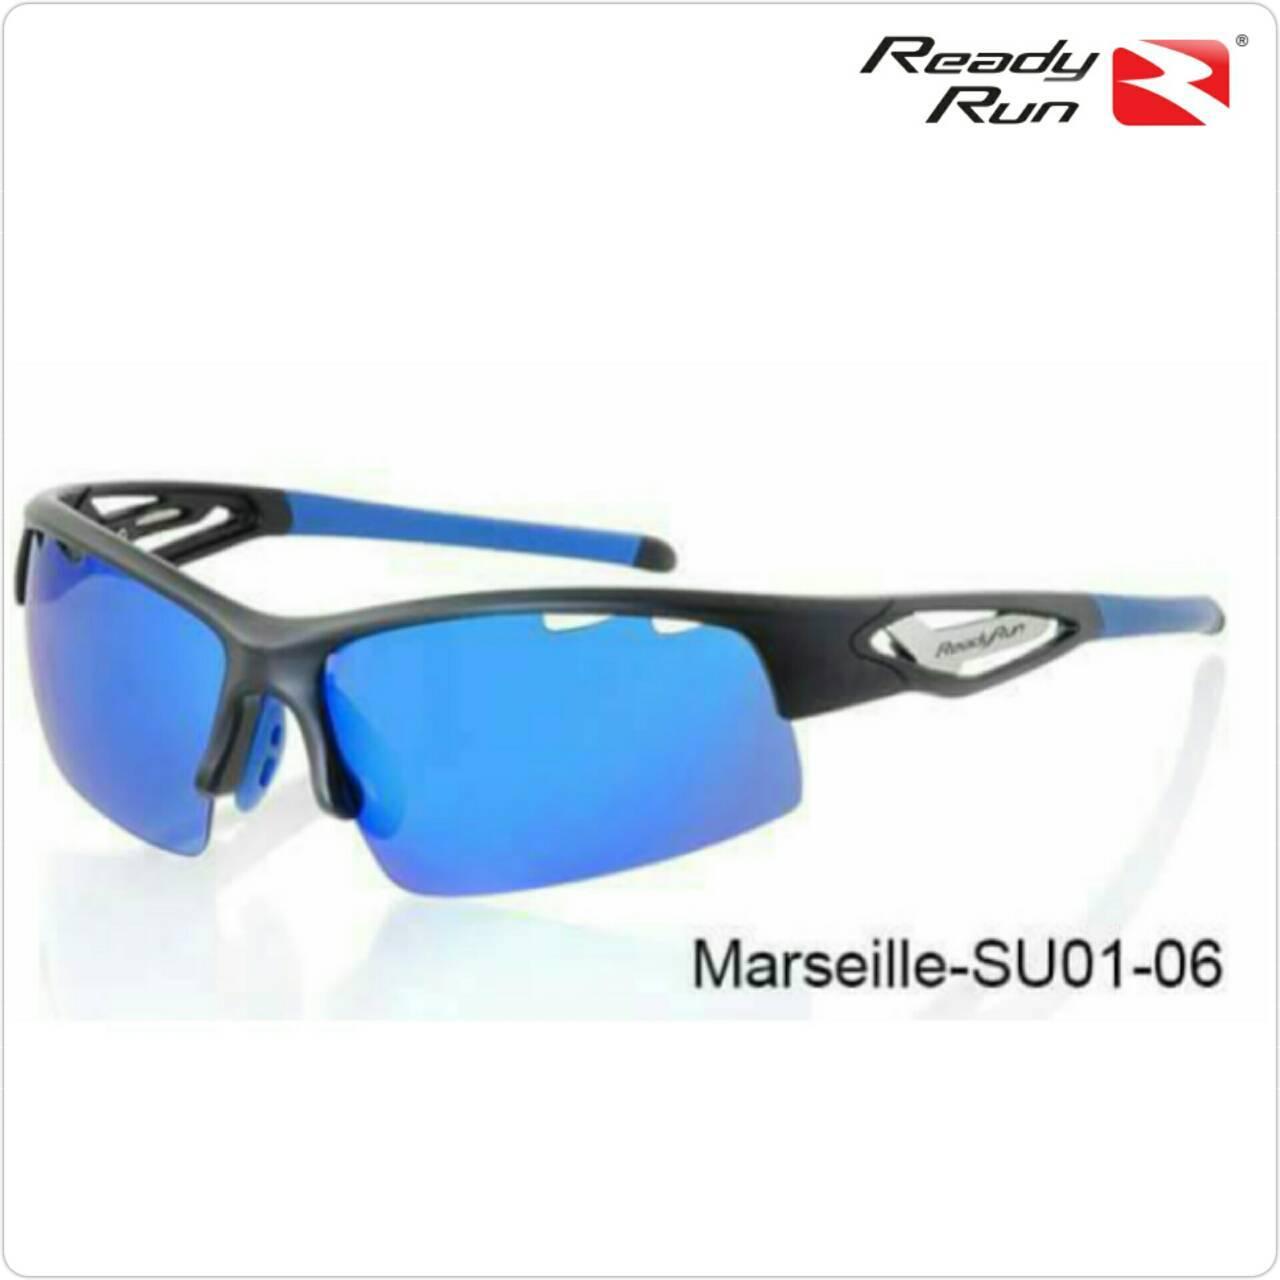 Marseille Series SU01